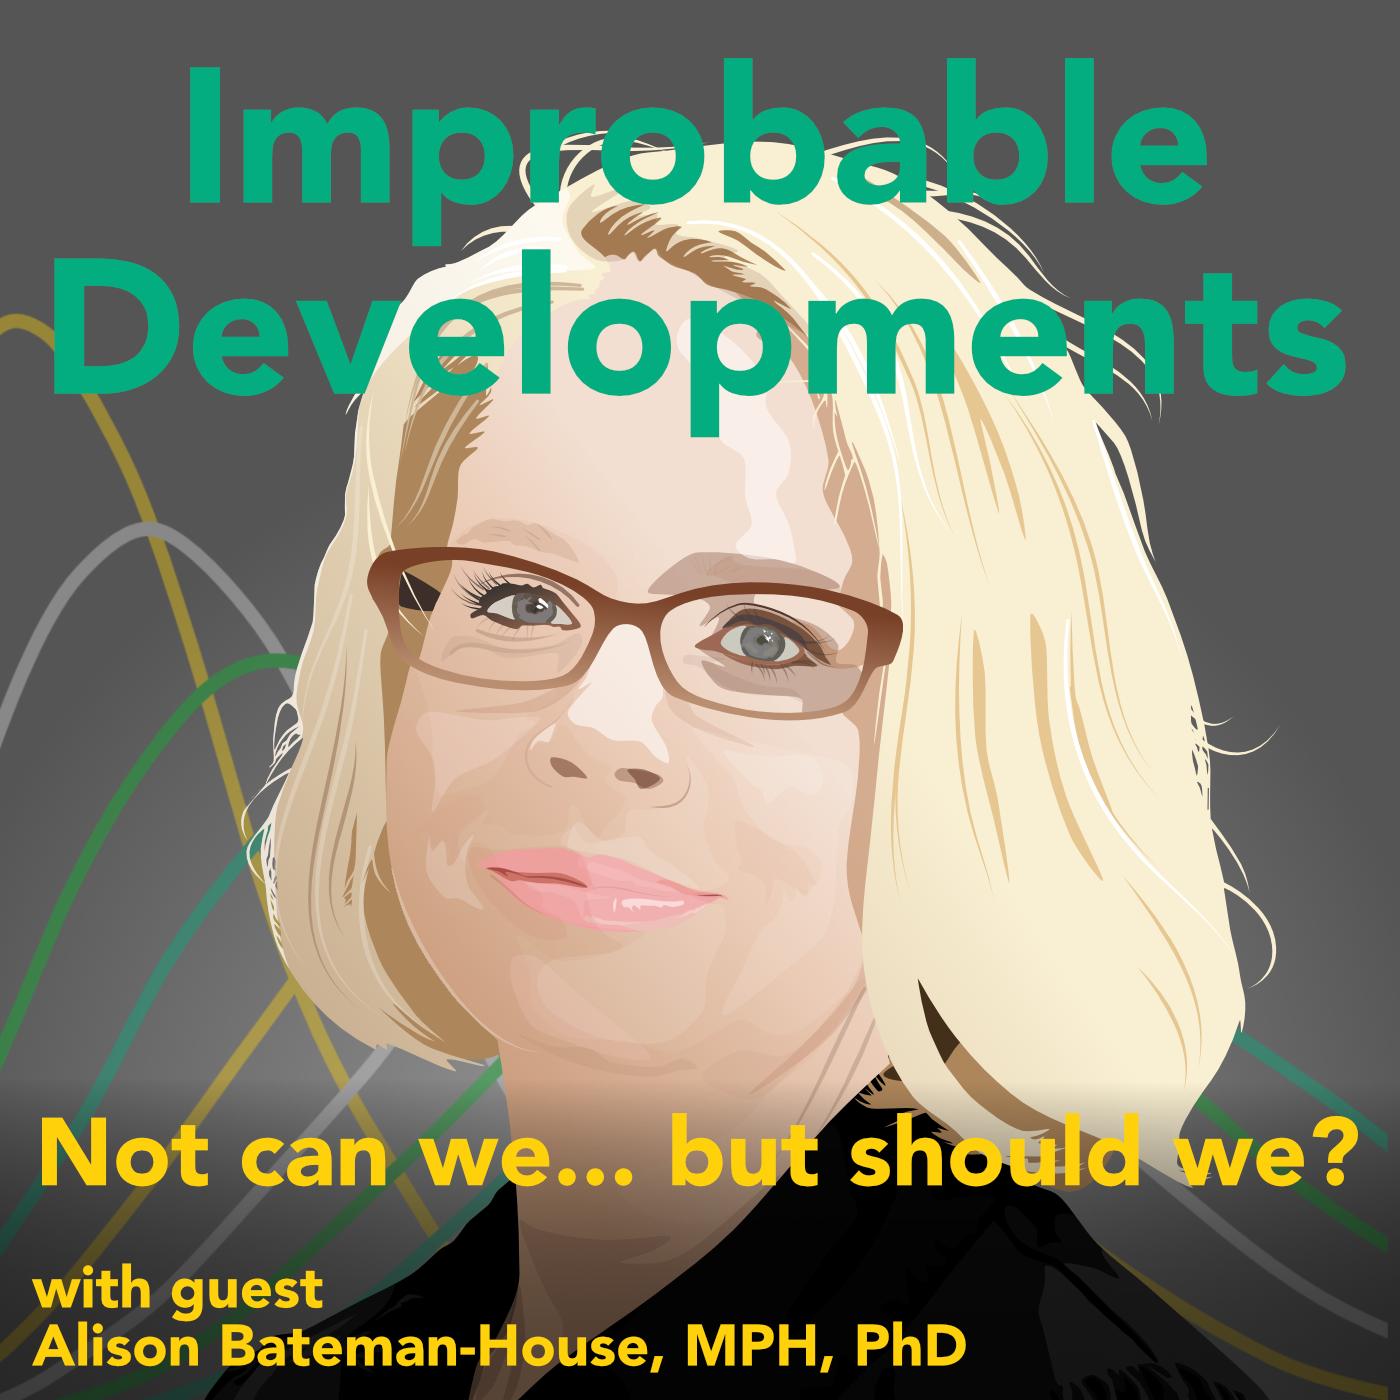 Artwork for podcast Improbable Developments